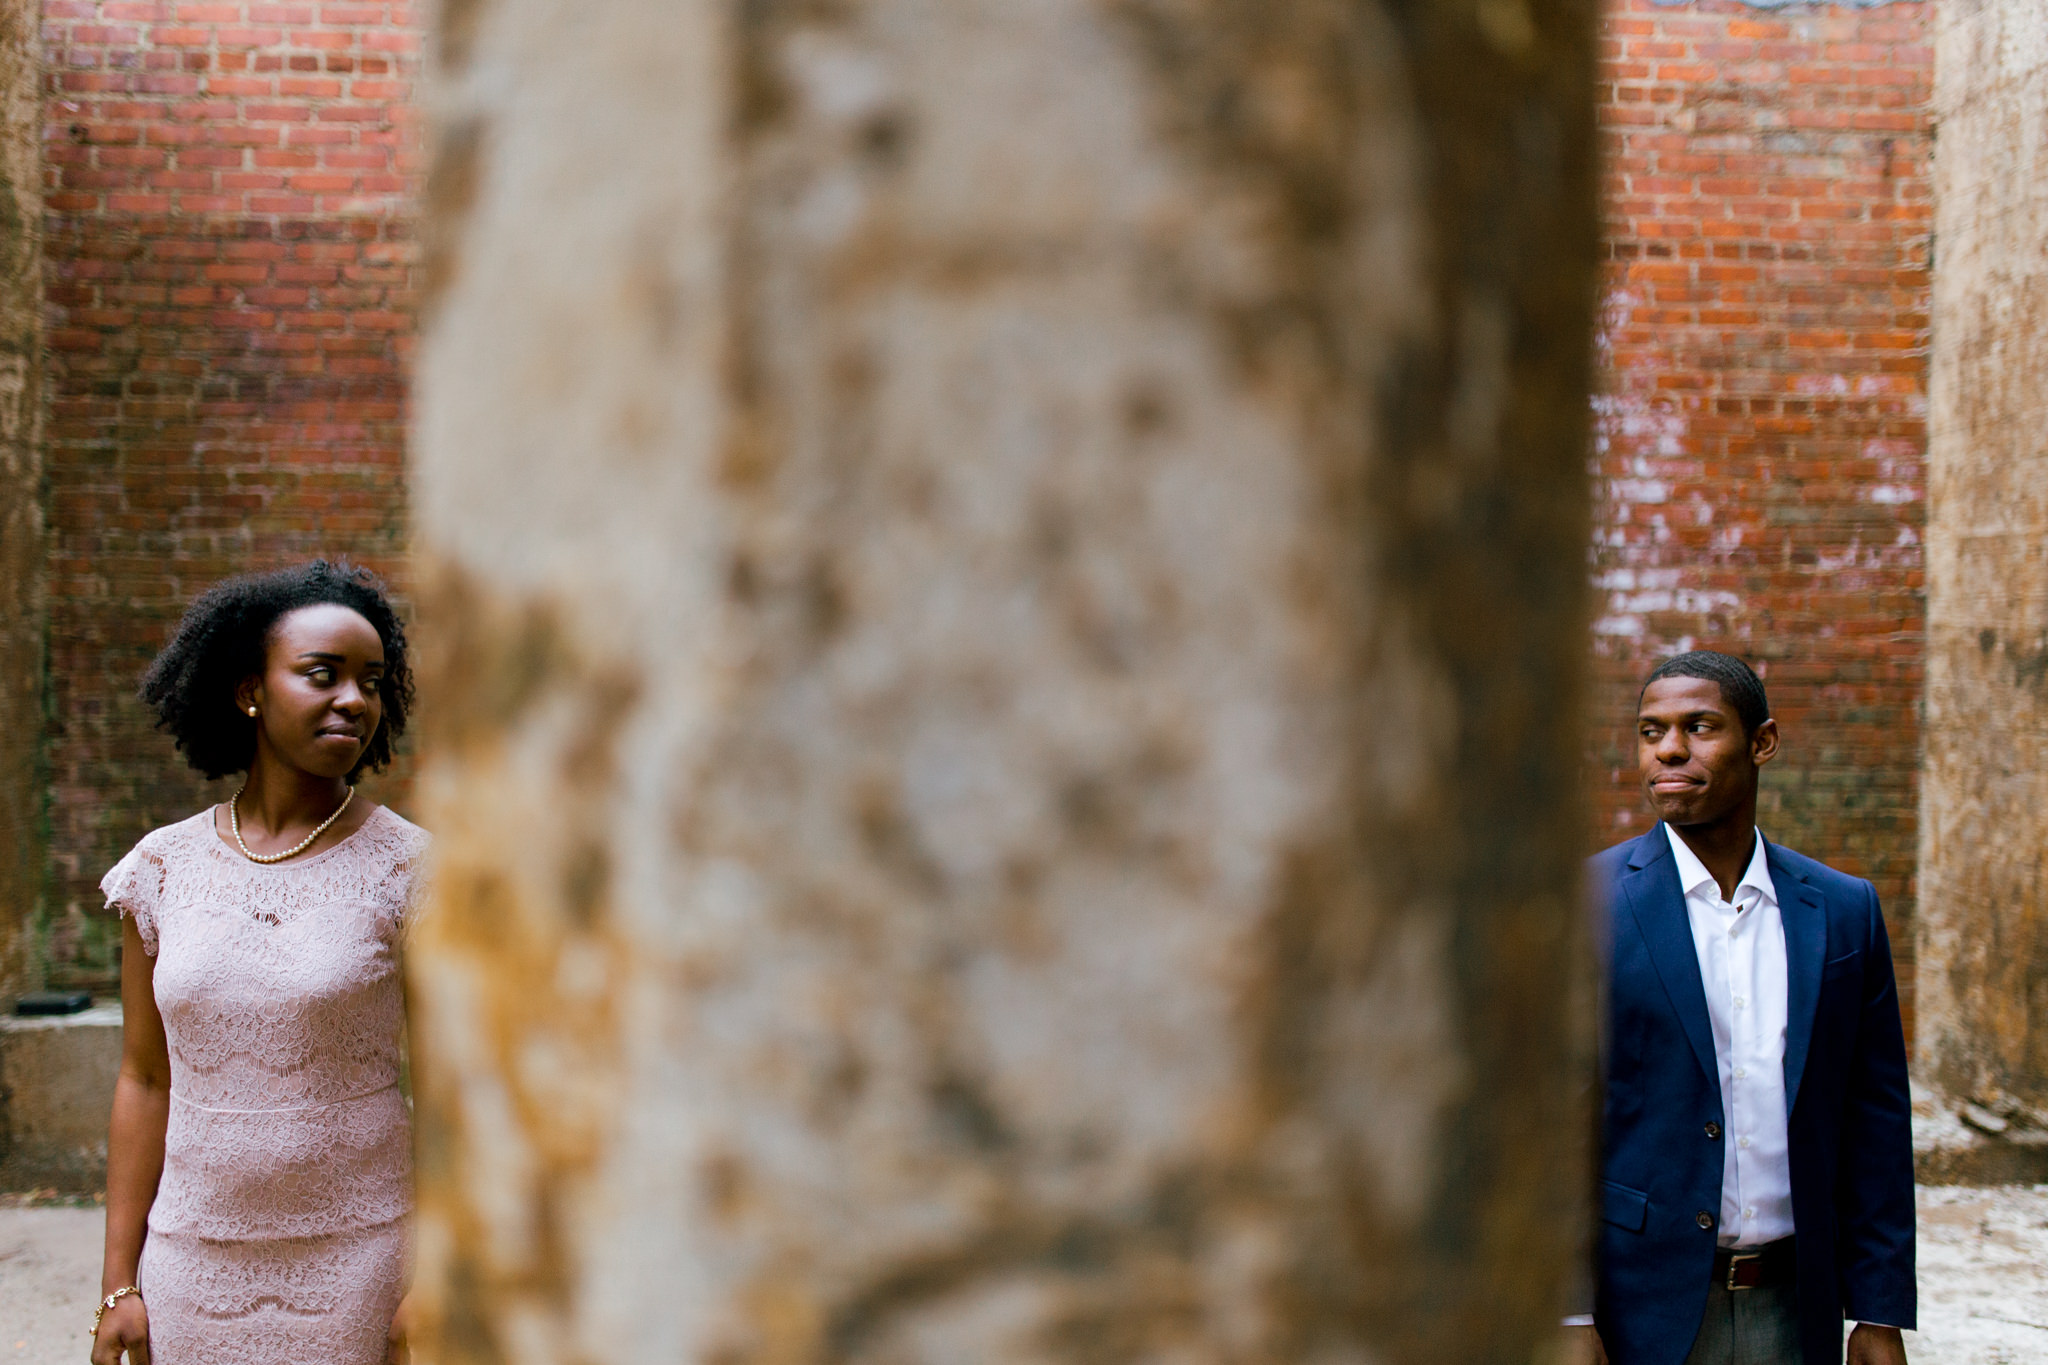 Grant-Park-Atlanta-Engagement-Pictures-Kiyah-C-Photography-22.jpg